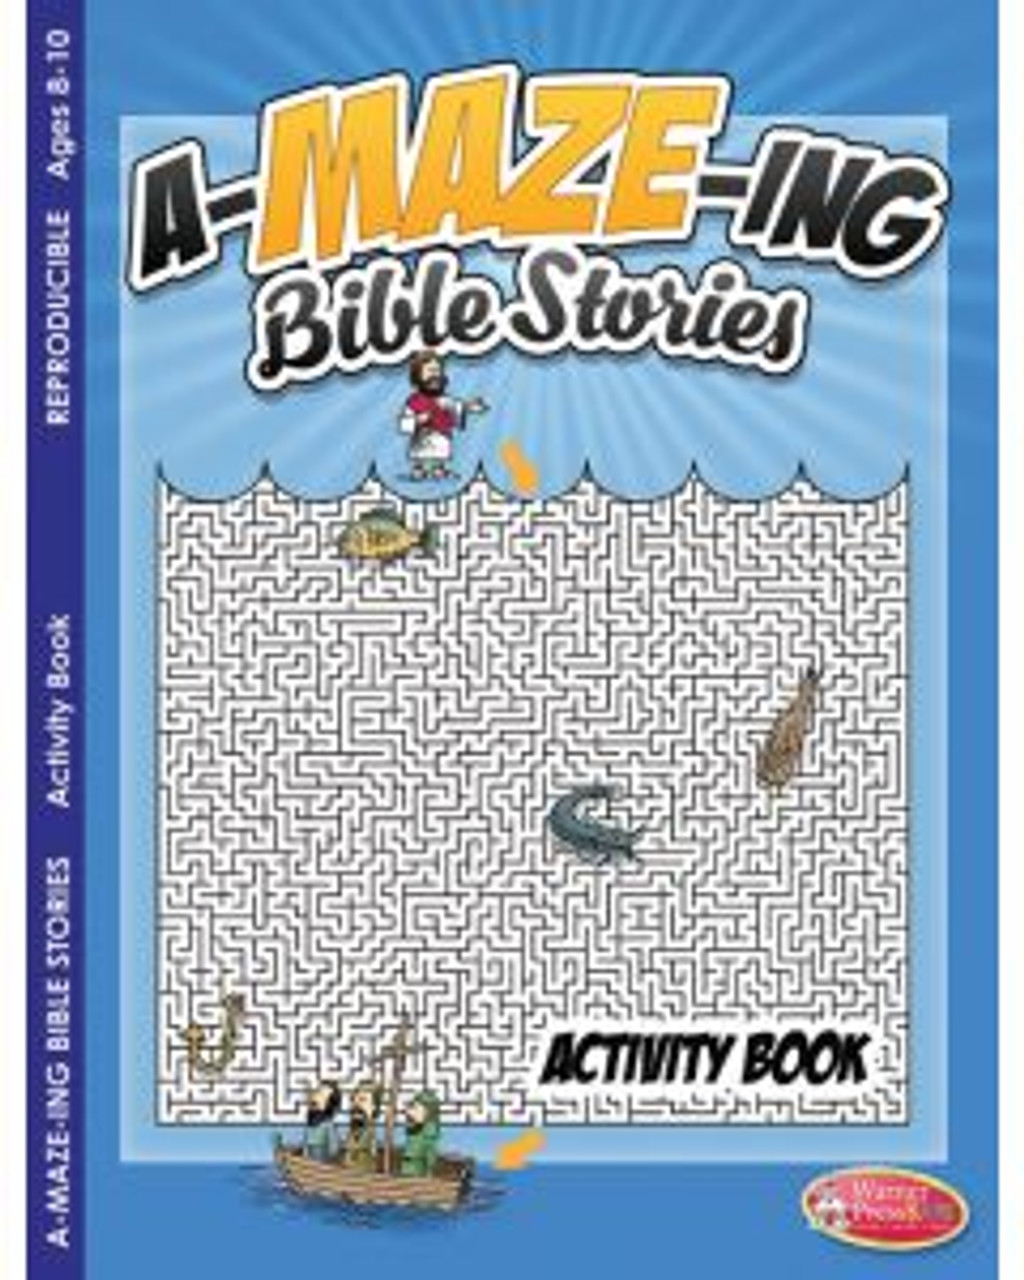 A-maze-ing Bible Stories (activity book)